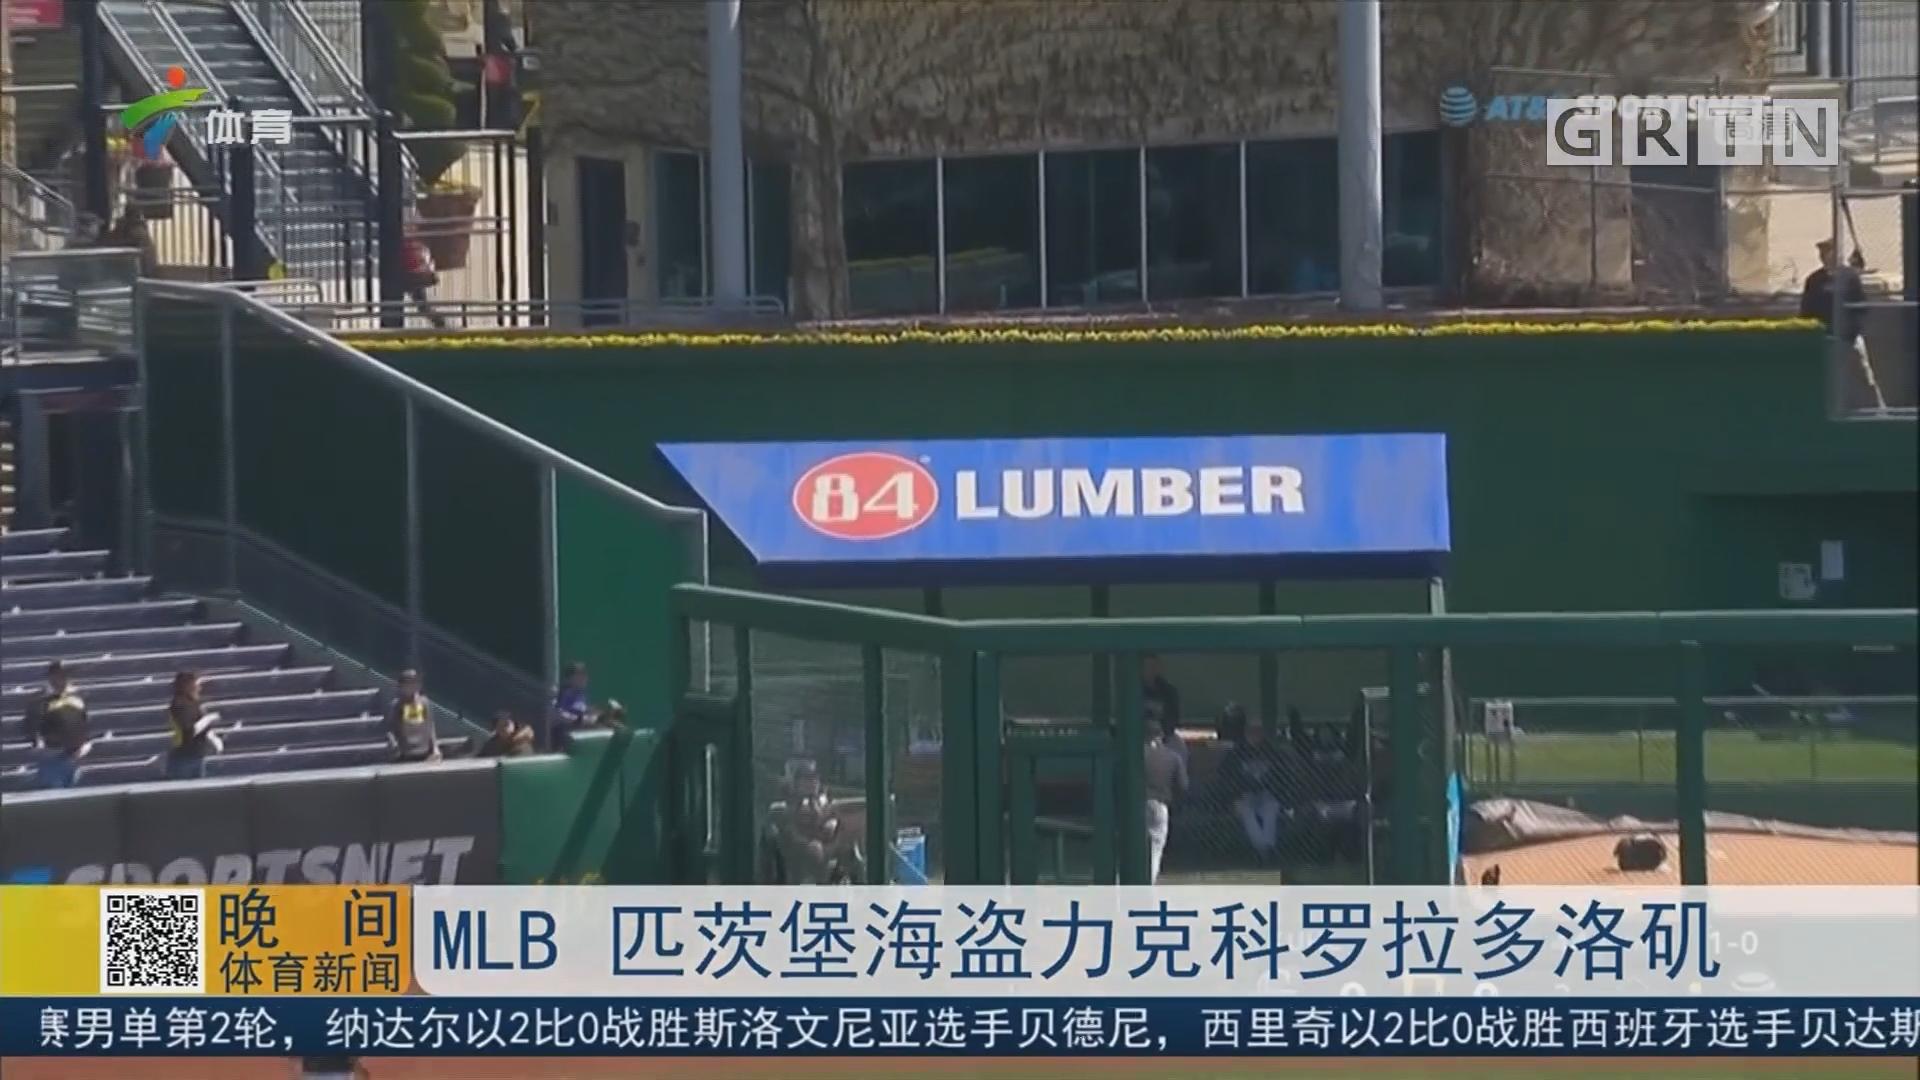 MLB 匹茨堡海盗力克科罗拉多洛矶